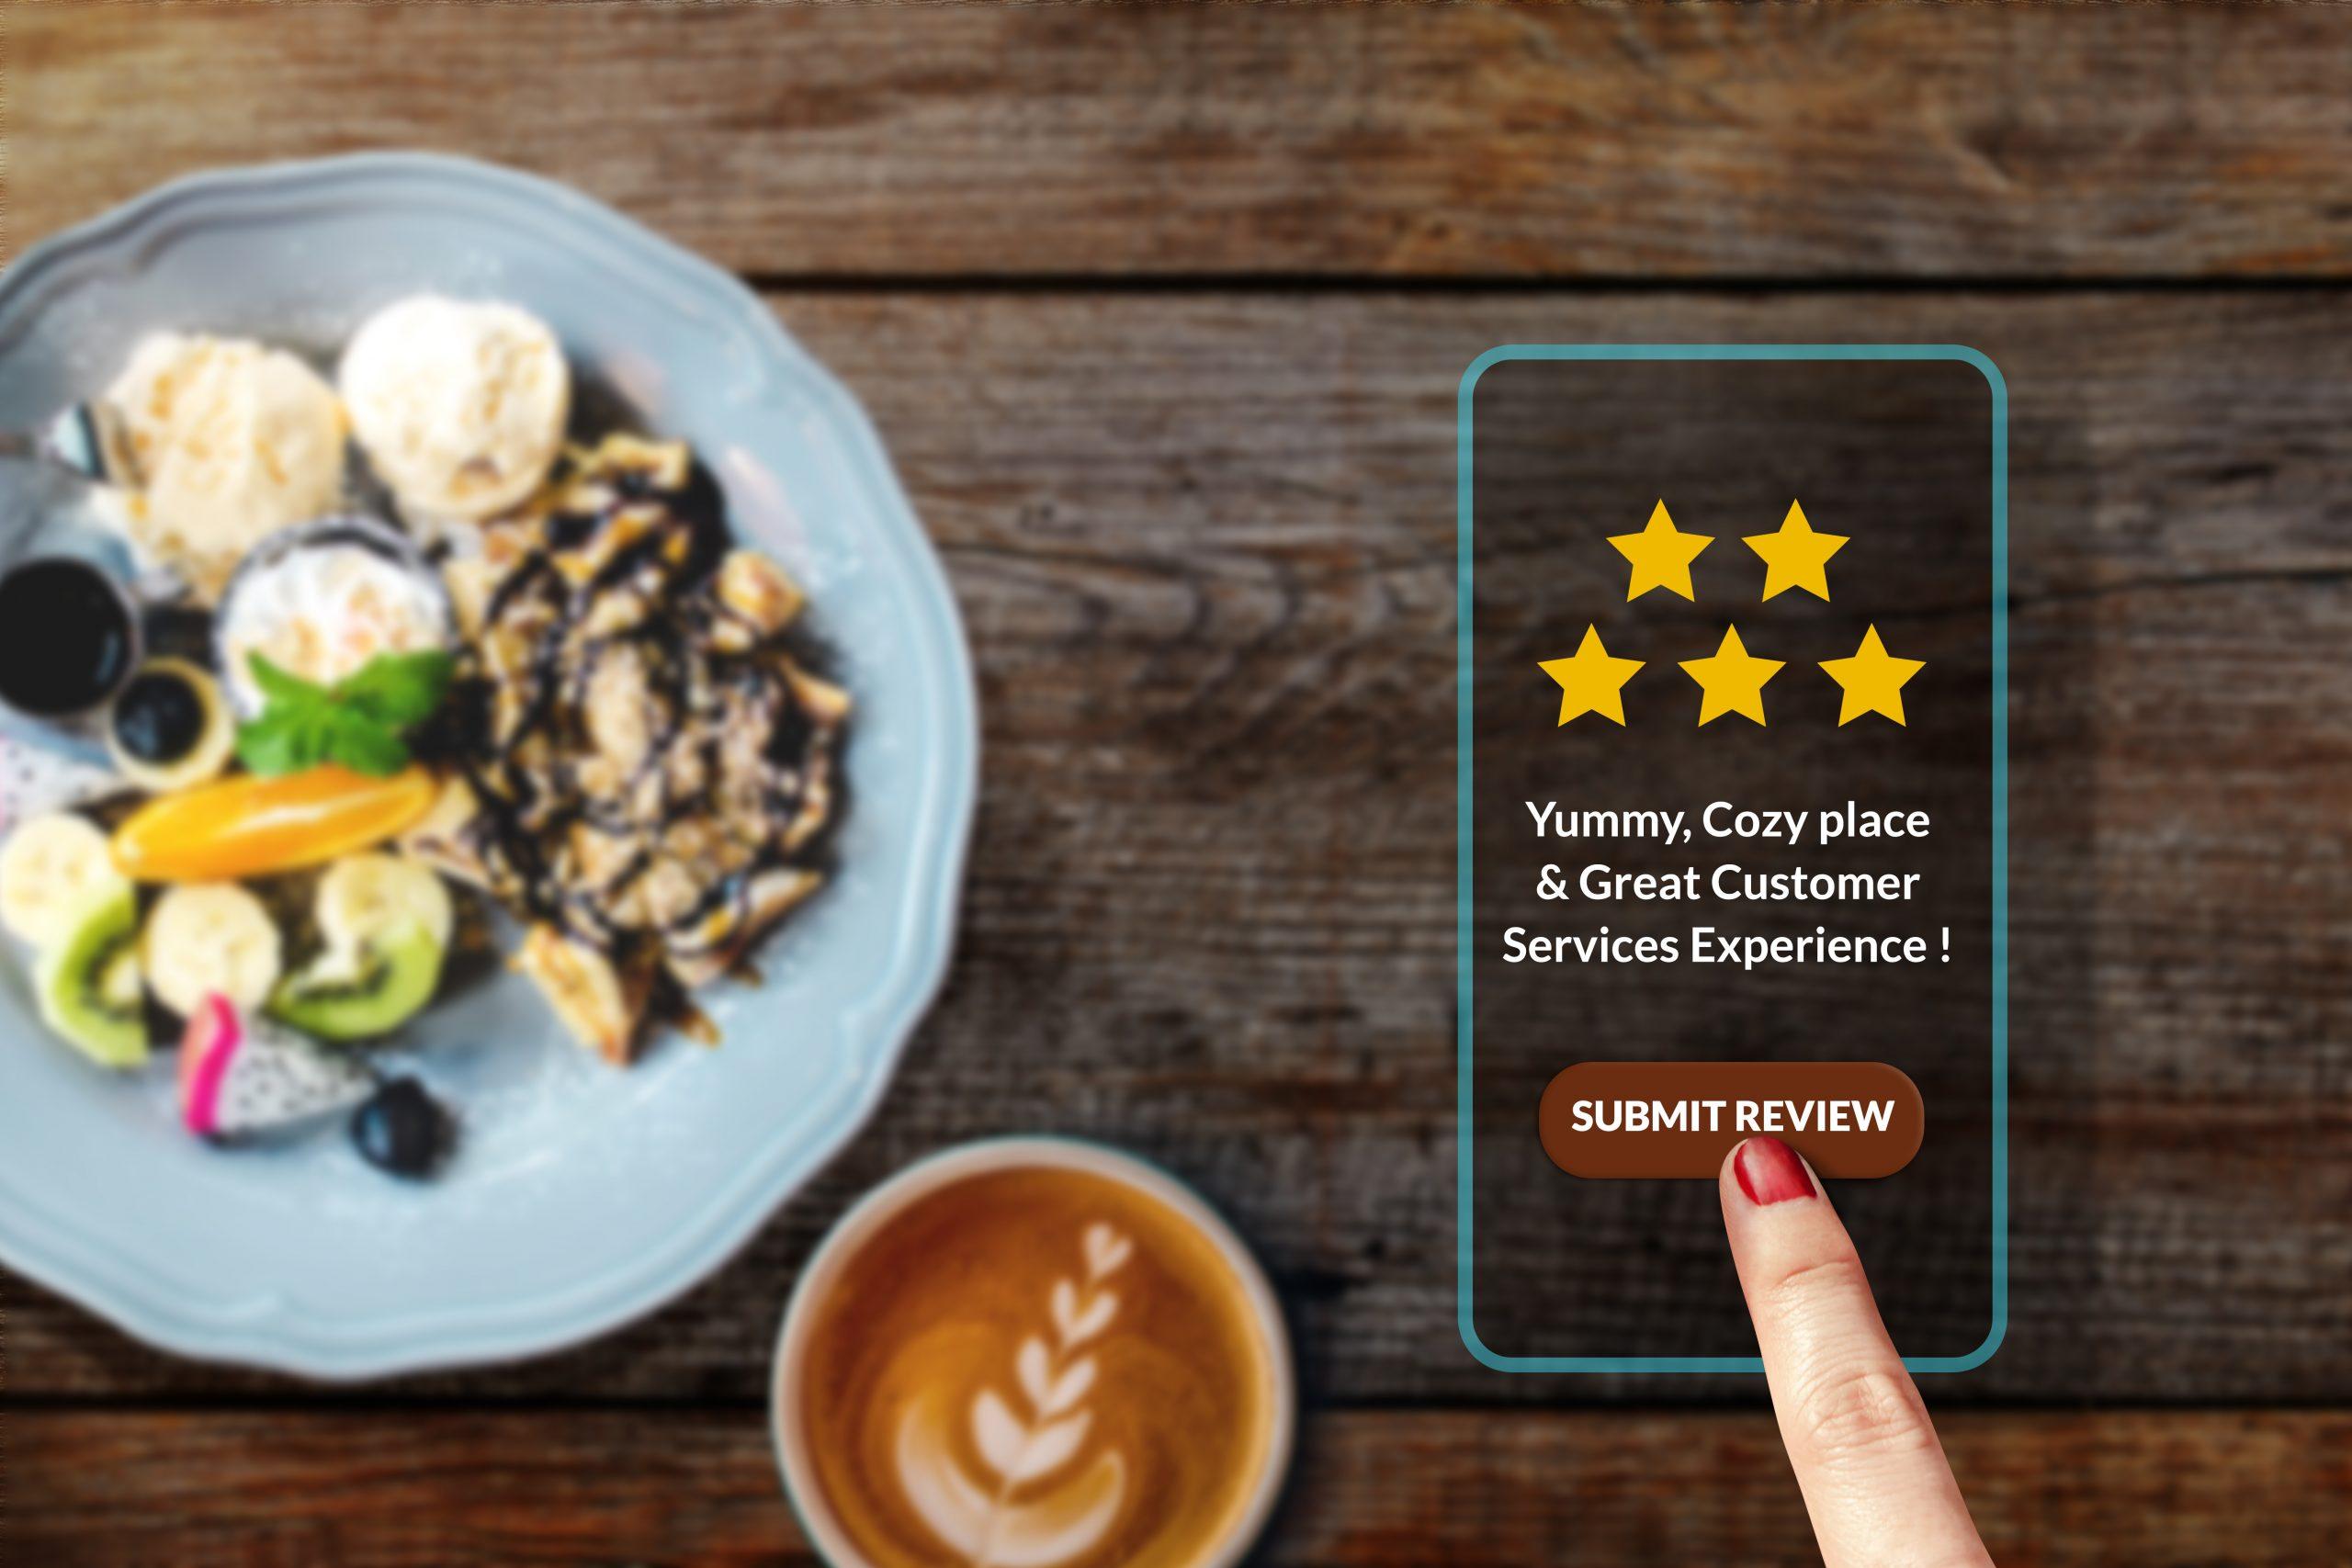 Digital Marketing Strategies to Help Your Restaurant Grow